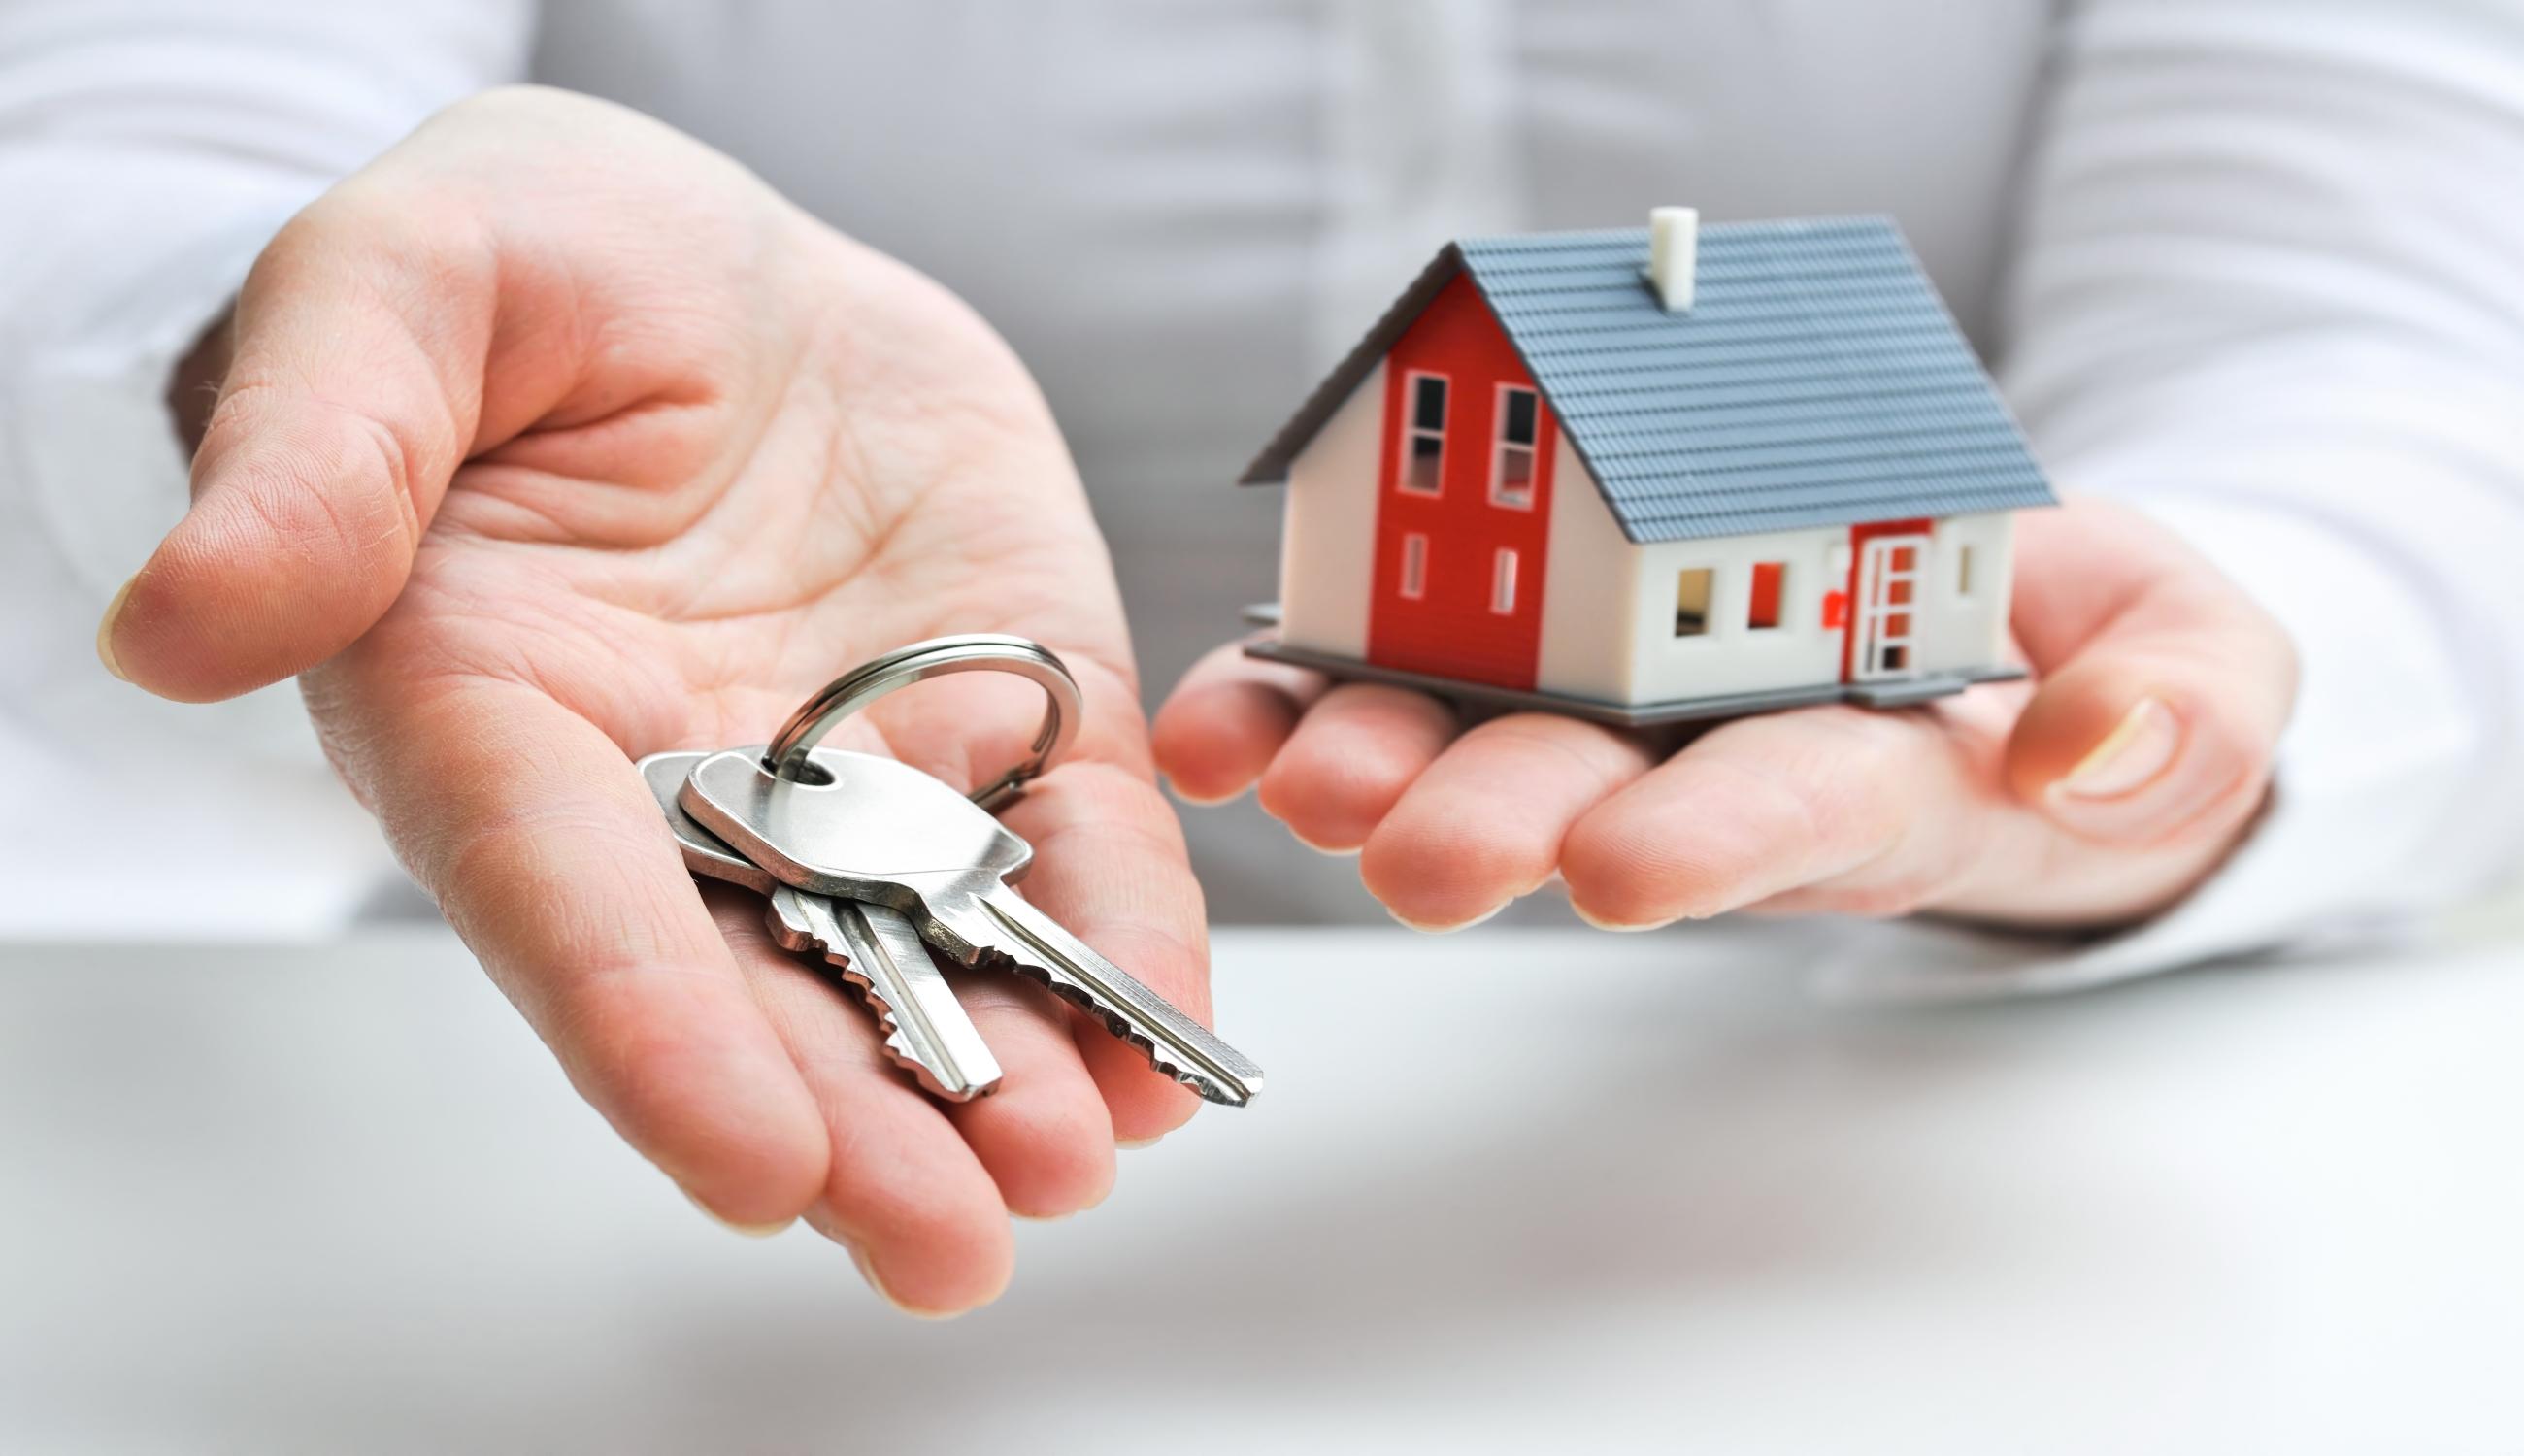 Benefits of having property management